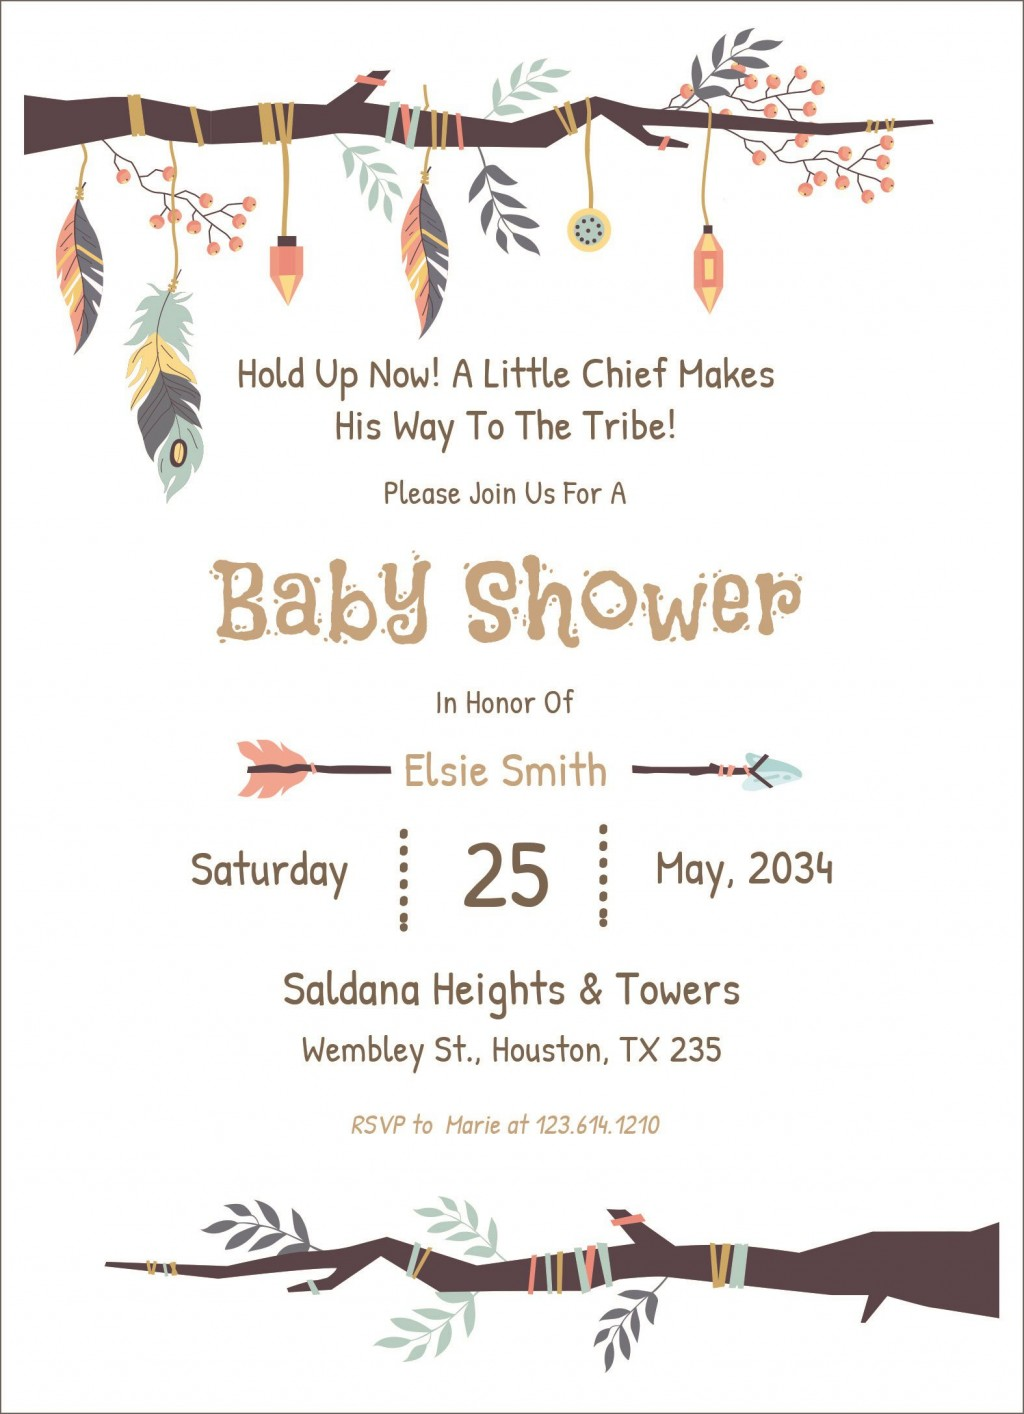 003 Formidable Free Baby Shower Invitation Template Editable High Def  Digital Microsoft WordLarge